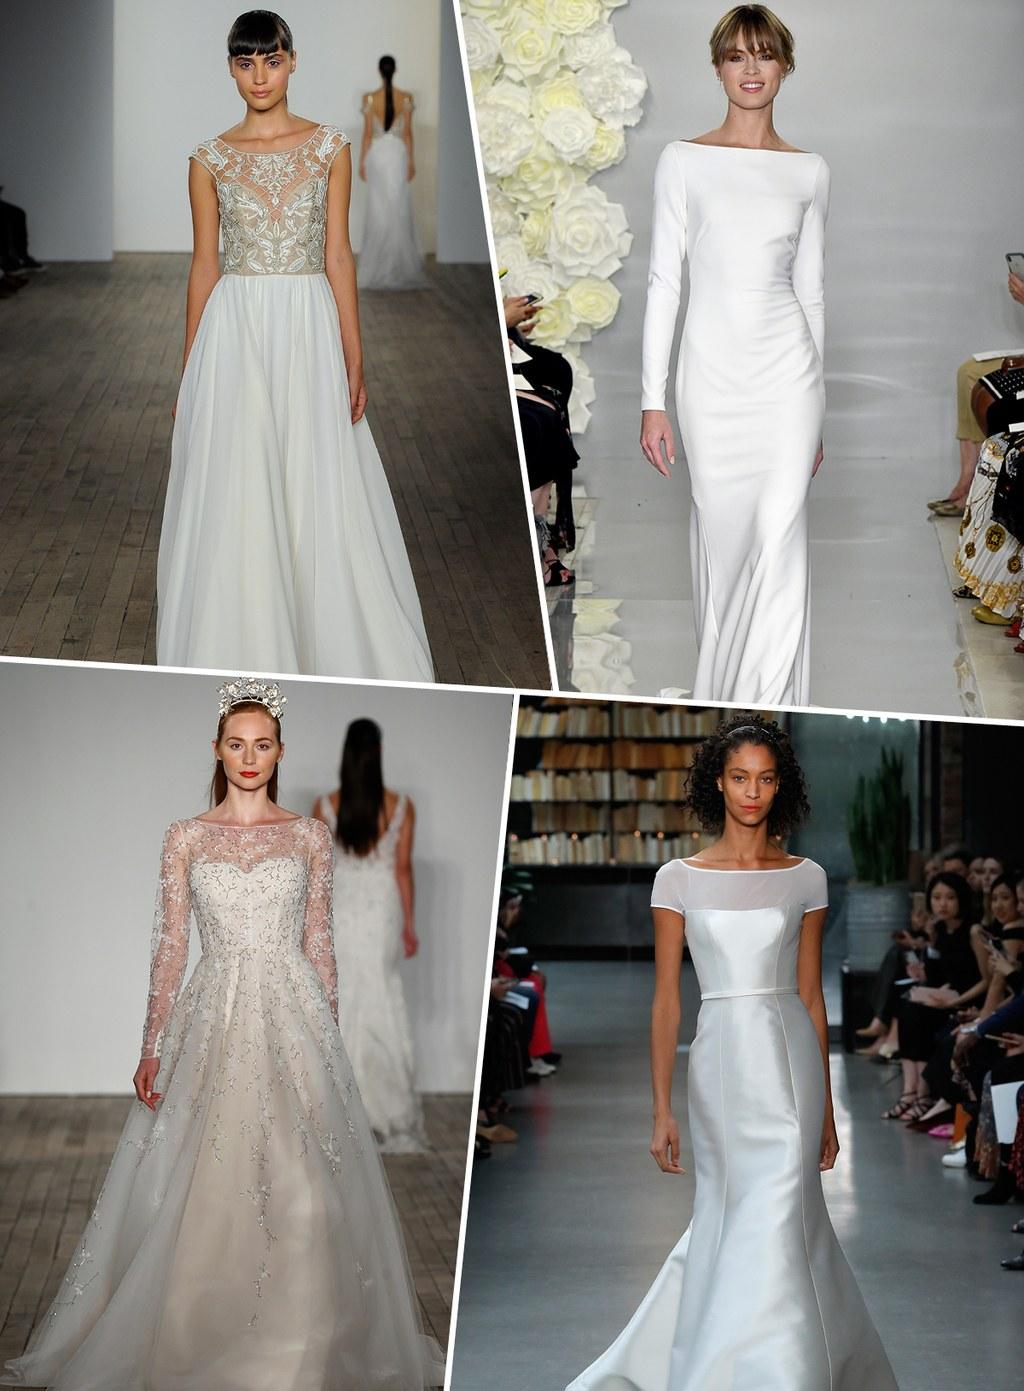 Bridalbliss.com   Bridalbliss.com   2019 Wedding Gown Trends   Martha Stewart Weddings